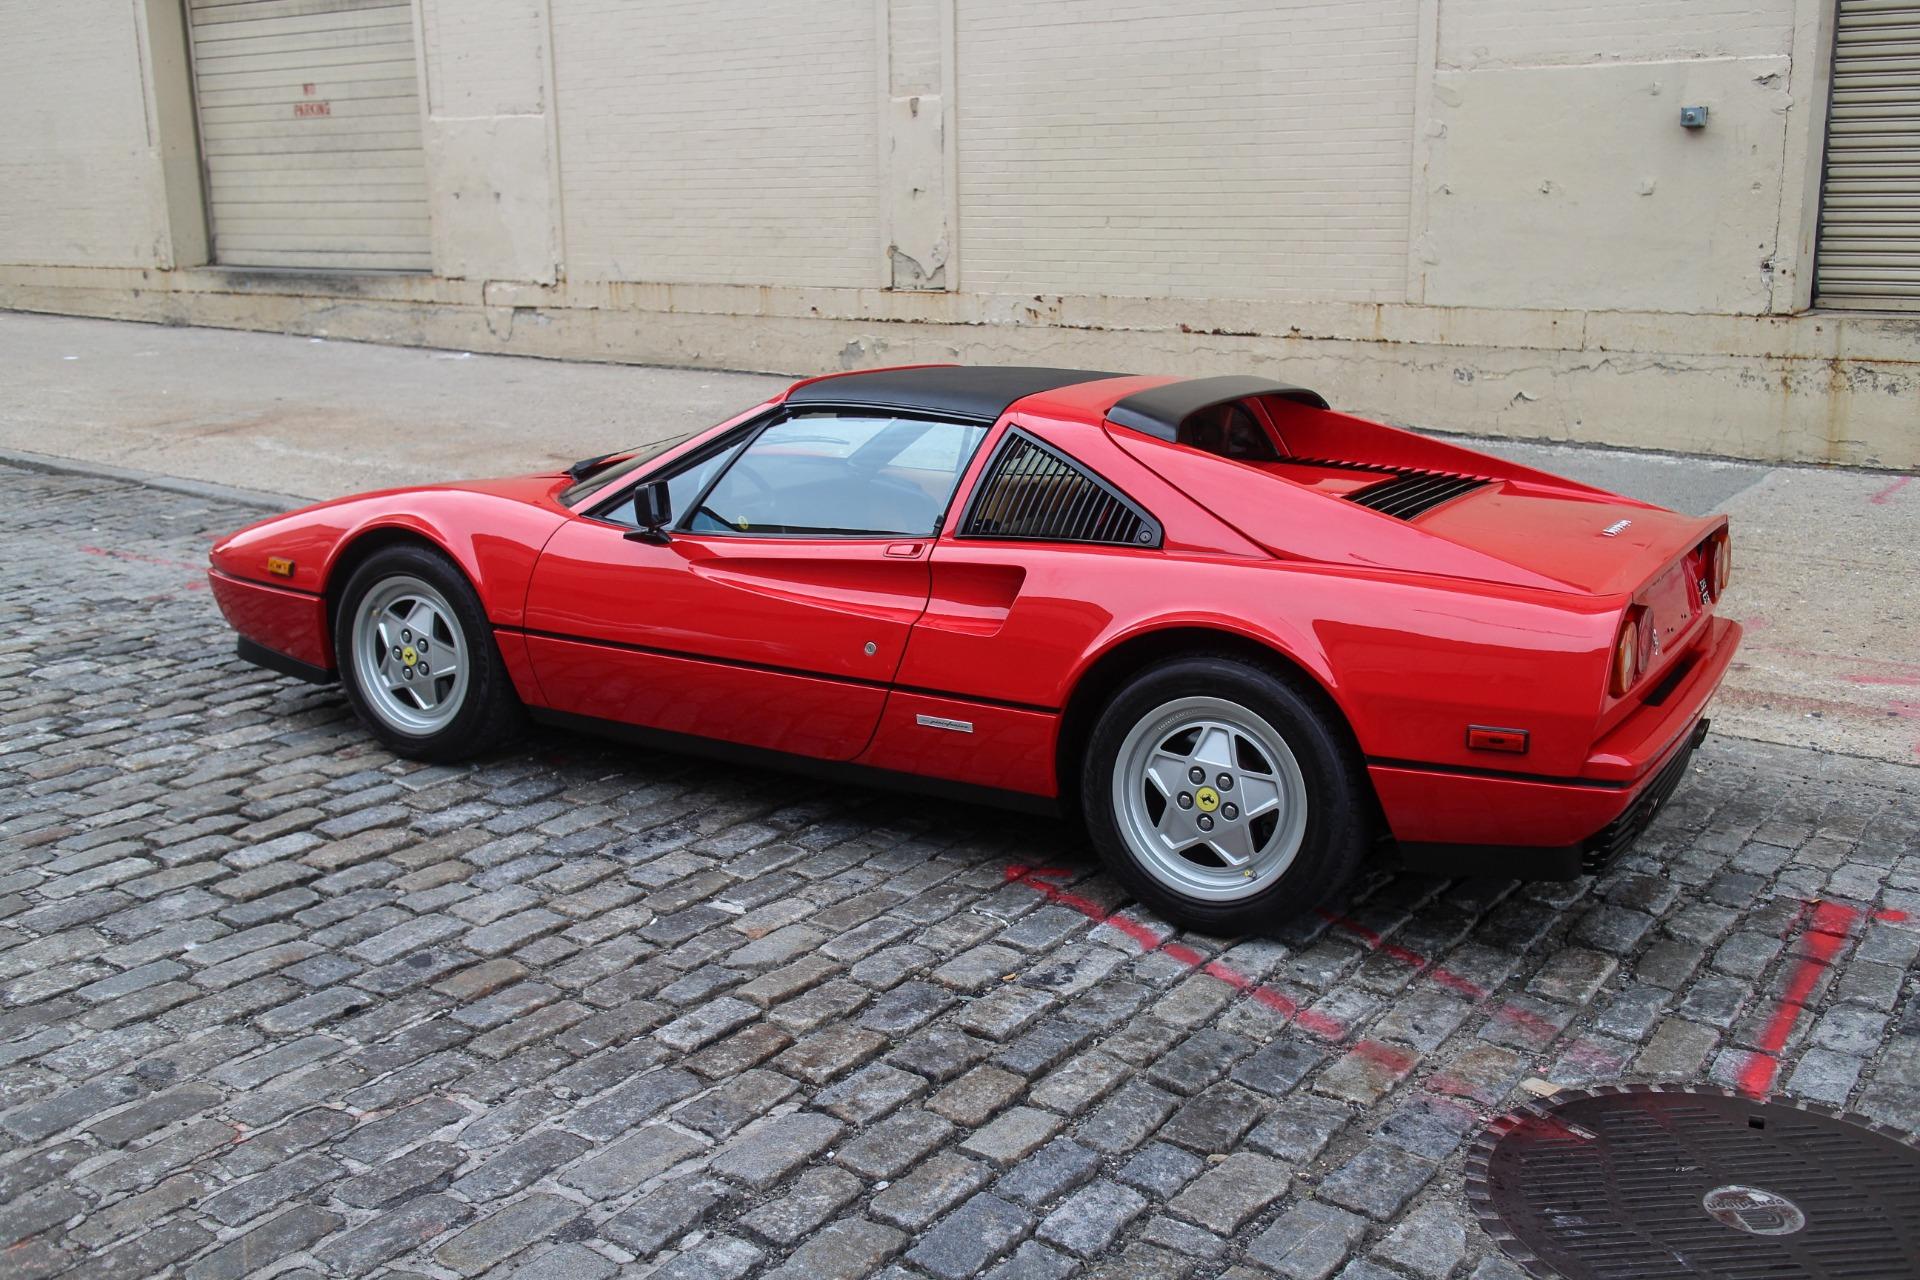 Ferrari Dealership Nyc >> 1989 Ferrari 328 GTS Stock # 783 for sale near New York ...